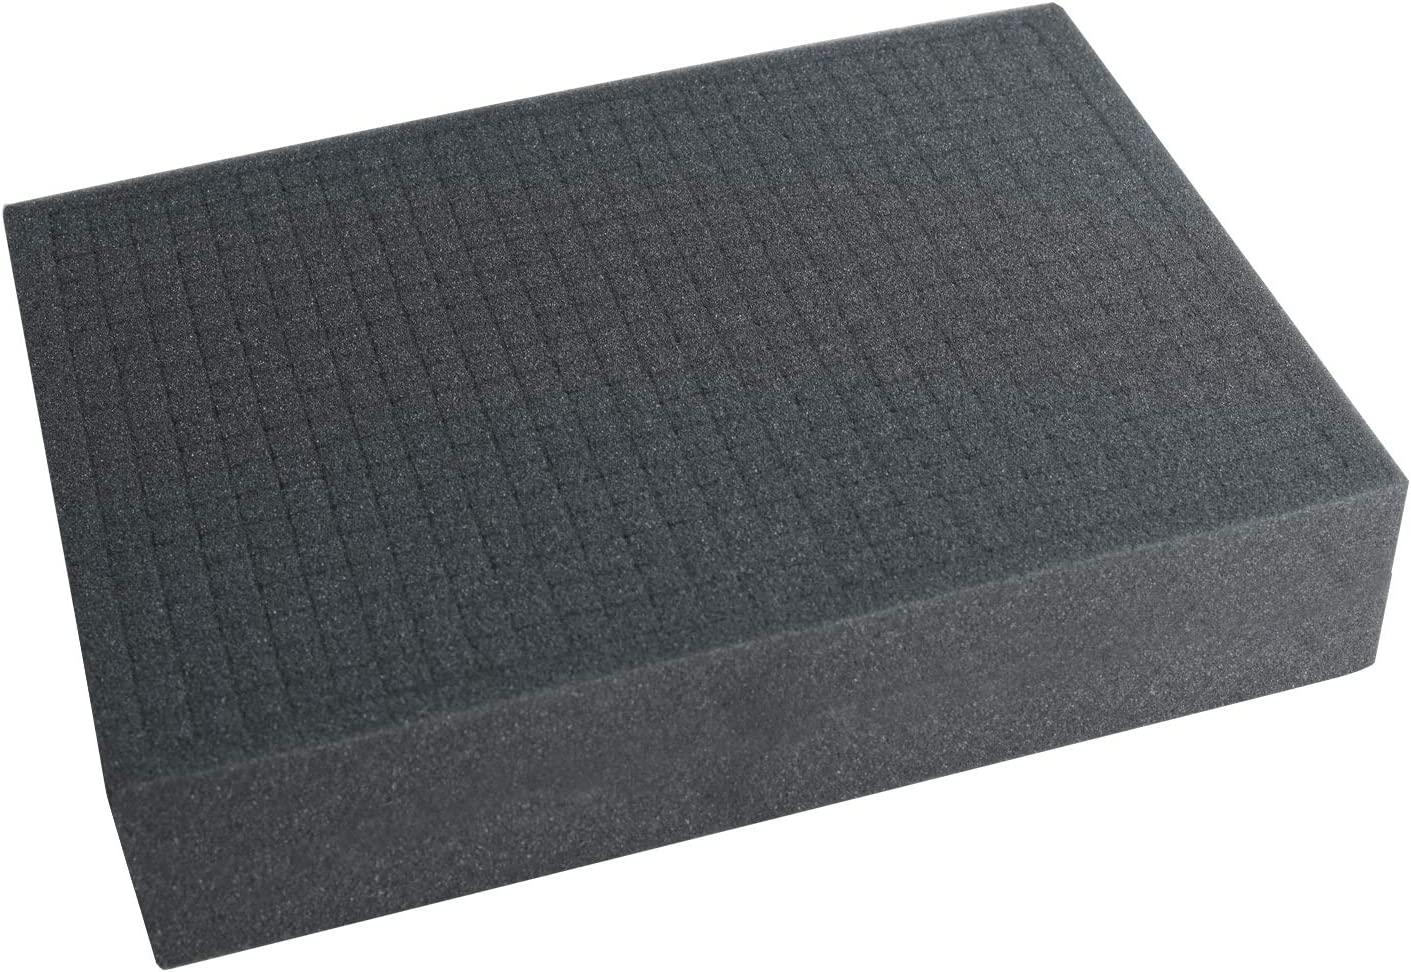 HMF 1451-90 Espuma Personalizable Precortada, Inserciones de Espuma para Cajas, 440 x 320 mm, Tabletop, Altura: 90 mm